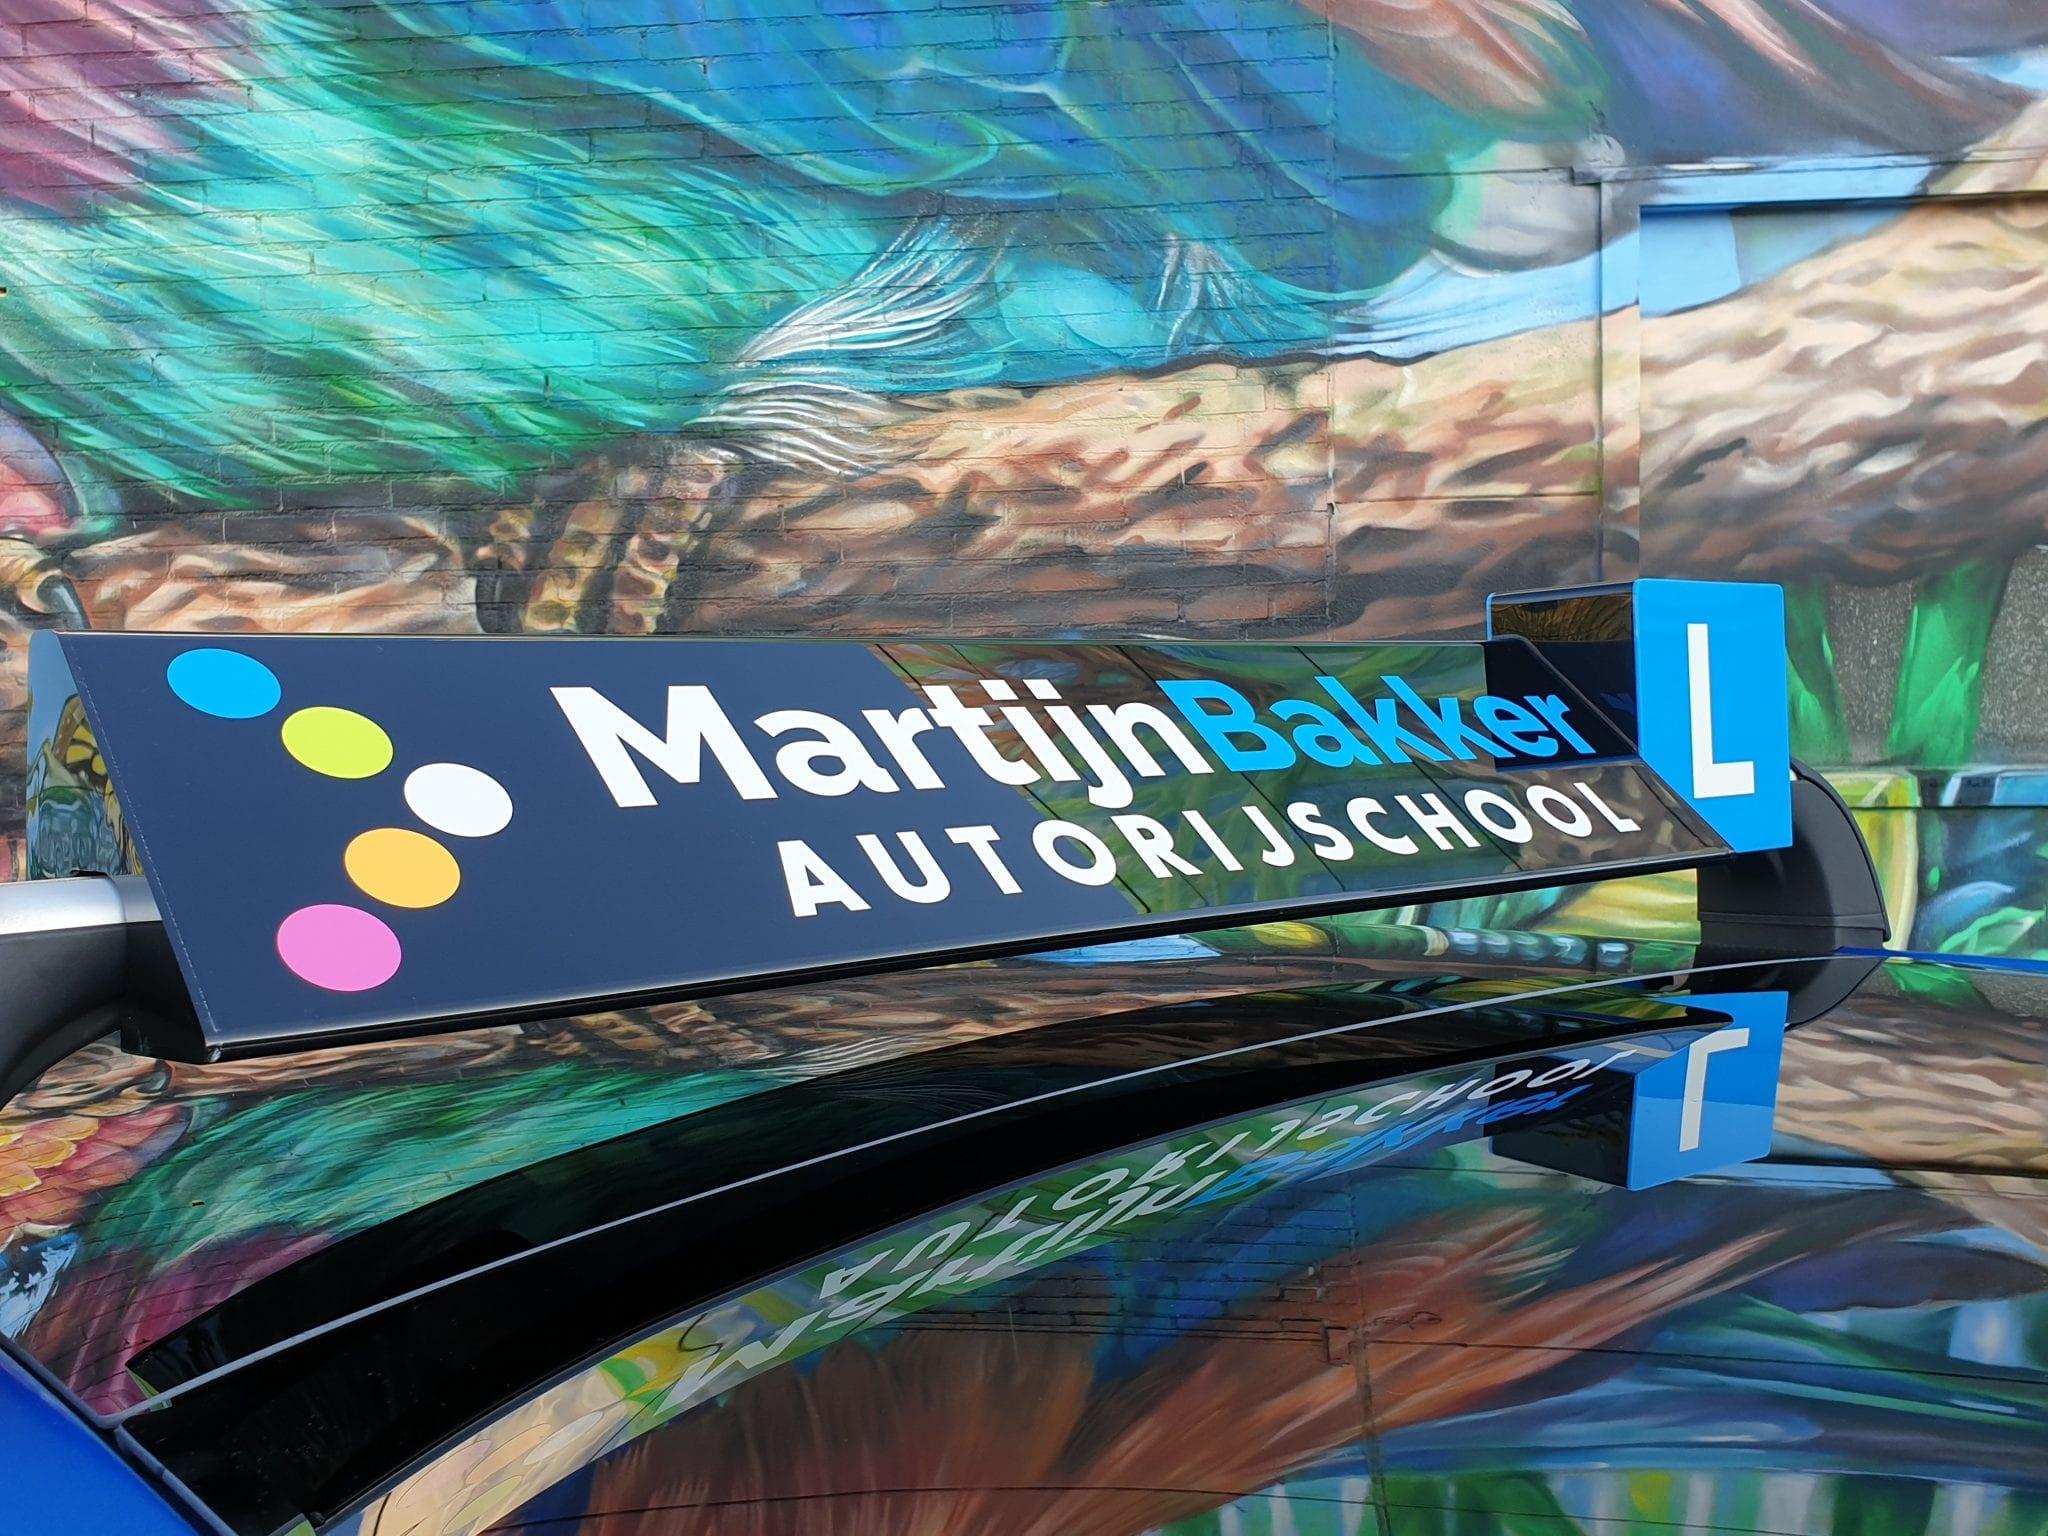 Autorijschool Martijn Bakker - Ford Focus Lesauto3